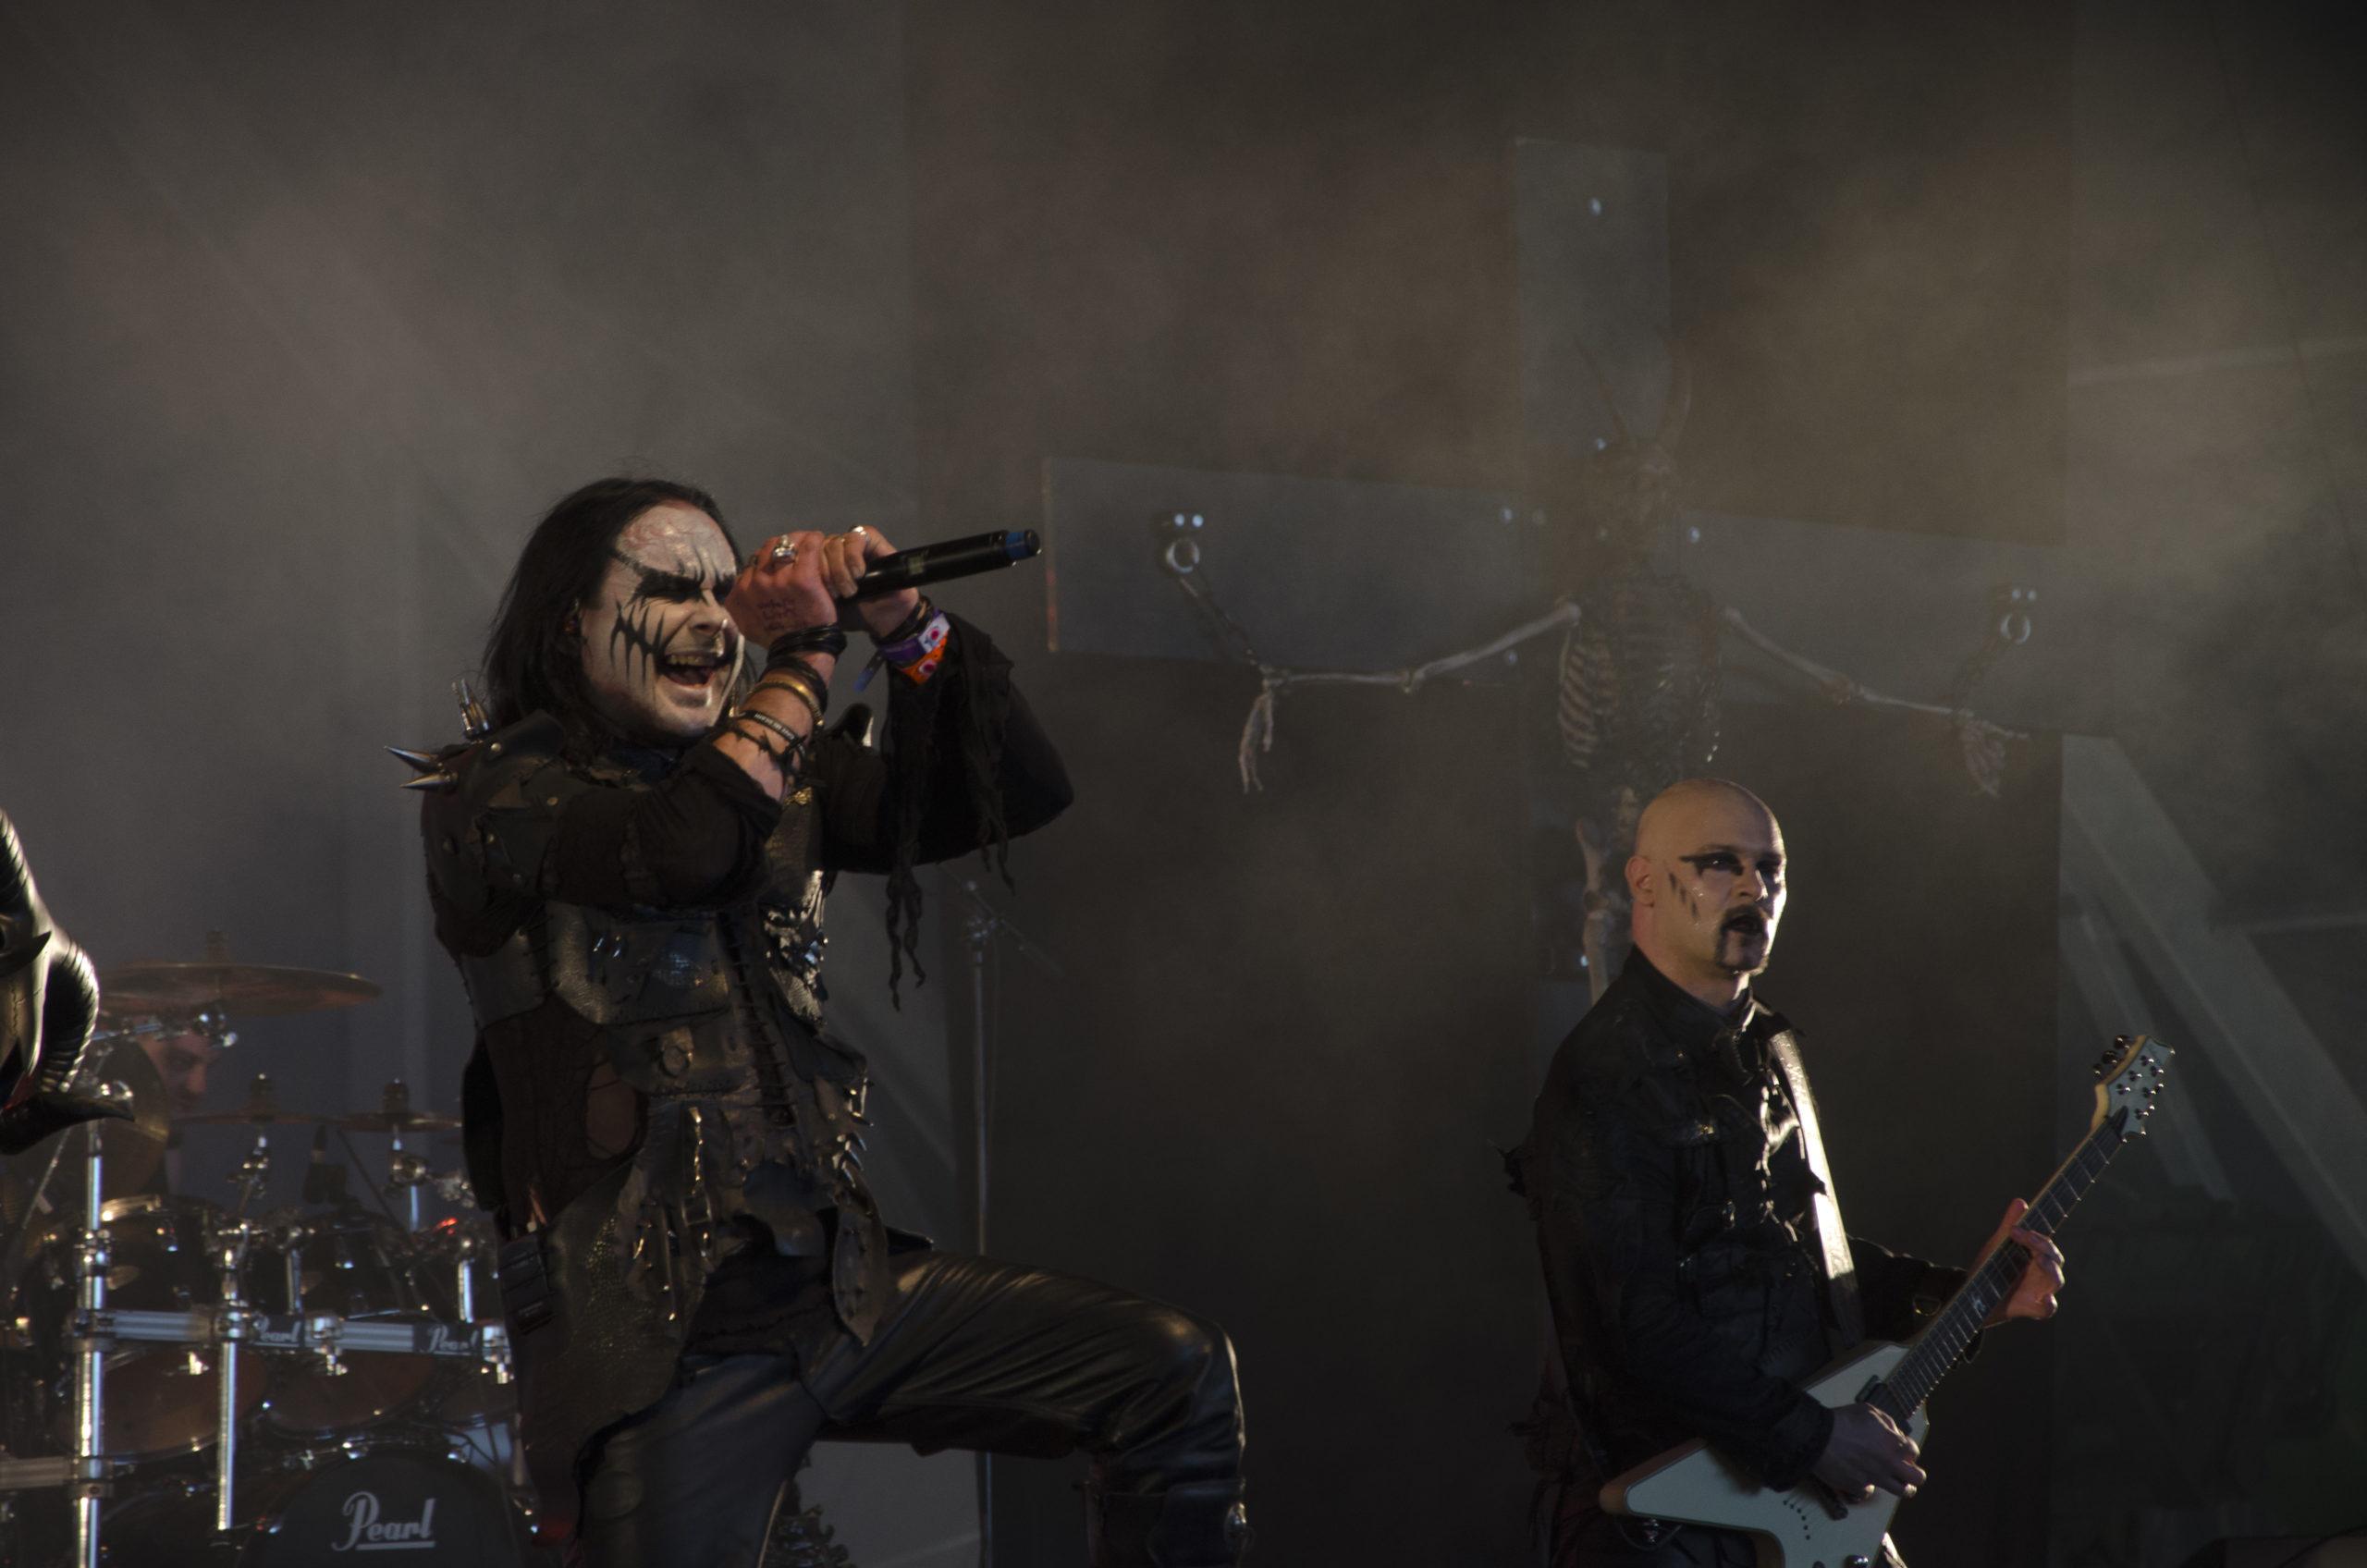 Cradle of filth - hellfest 2015 - Aura Noire